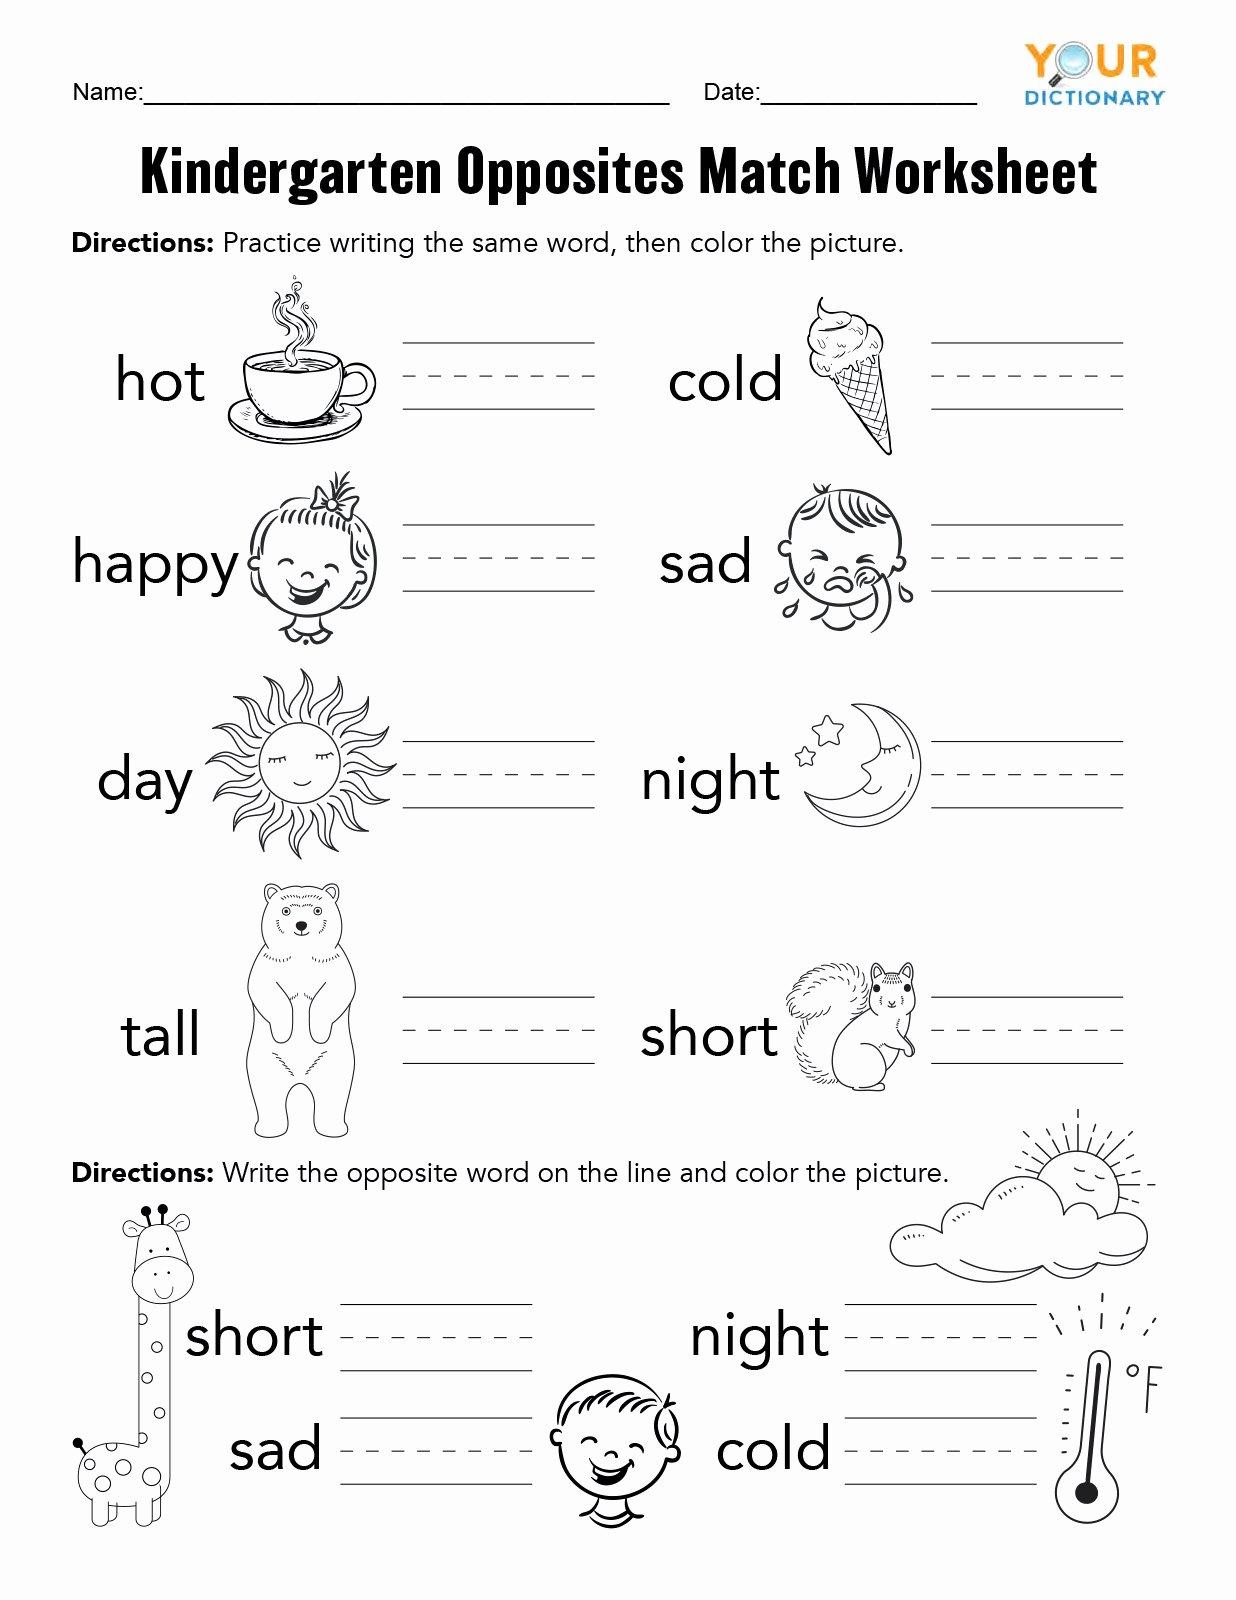 Free Printable Opposites Worksheets for Preschoolers Fresh Kindergarten Opposites Worksheet Remarkable Learning Sheets